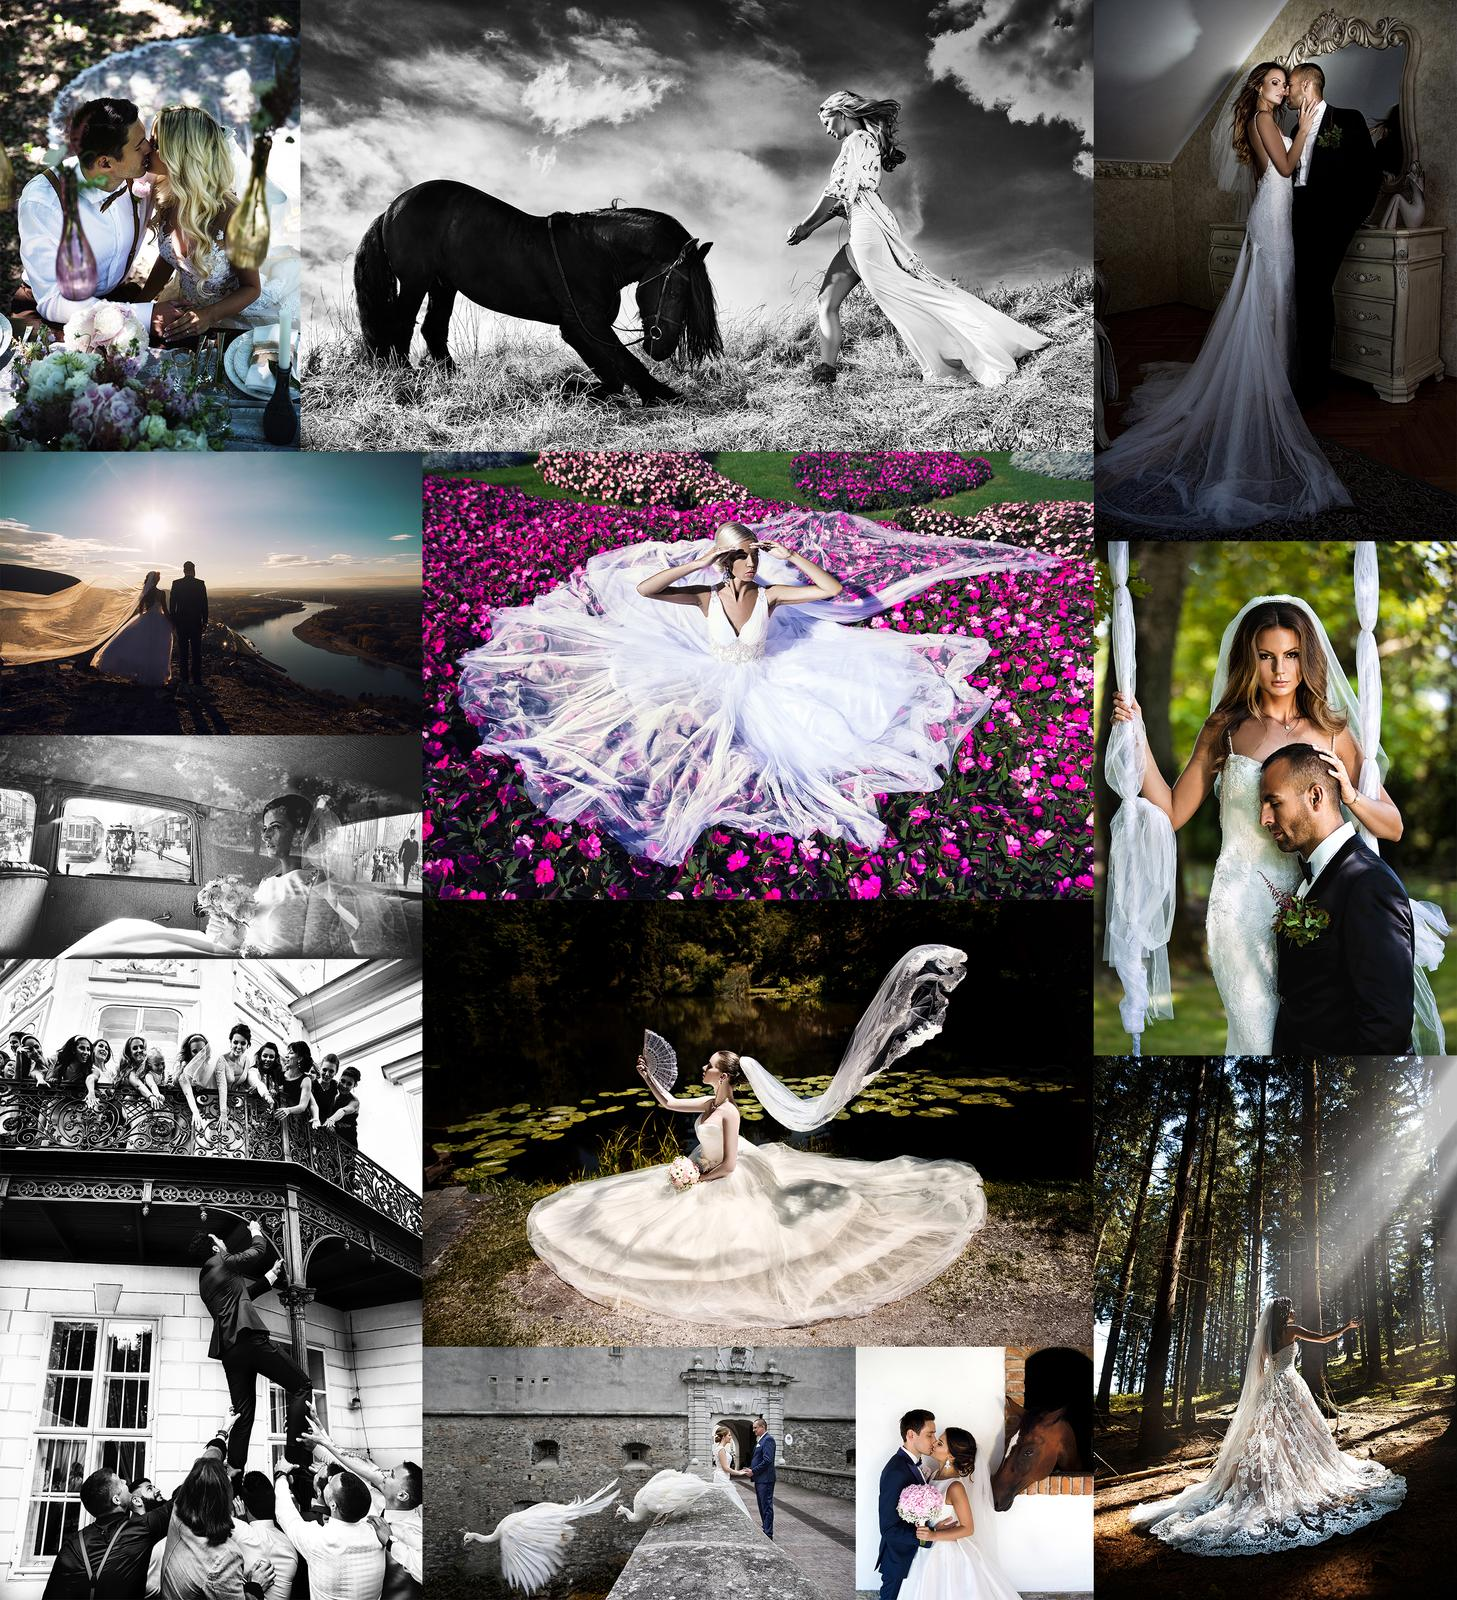 Weddings - © M I Q O • C A S H, EP - #mojenajmilsie